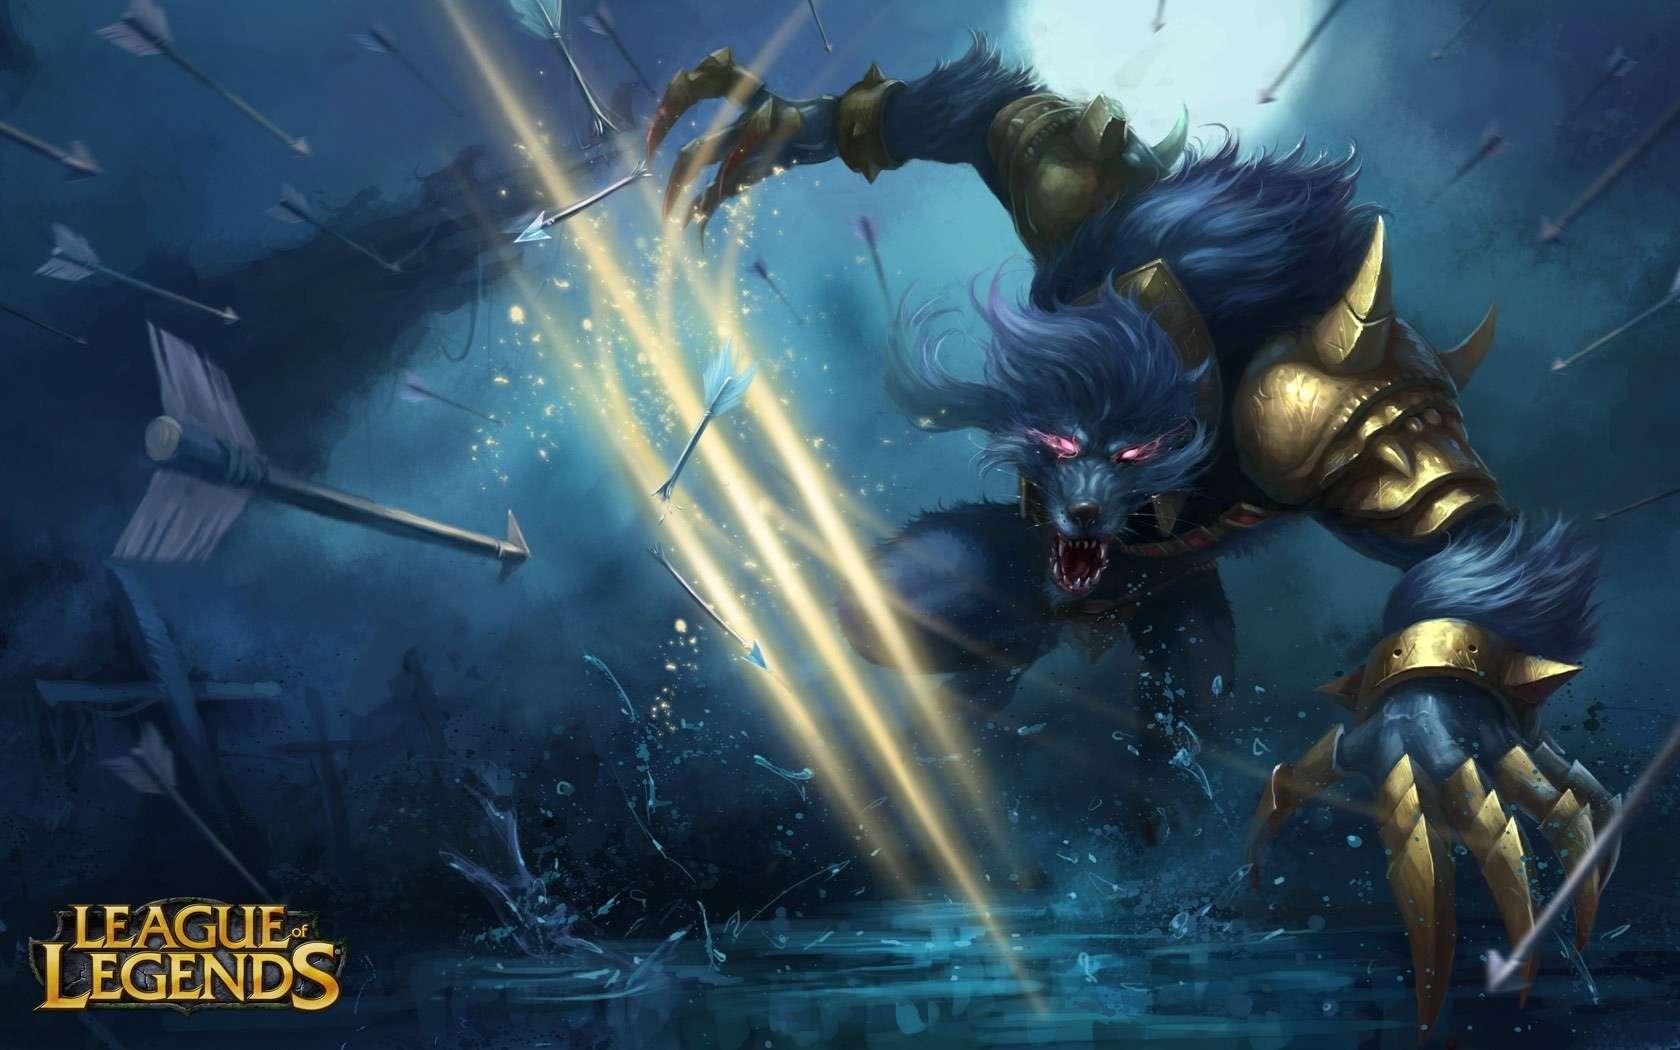 League of Legends Wallpaper 110